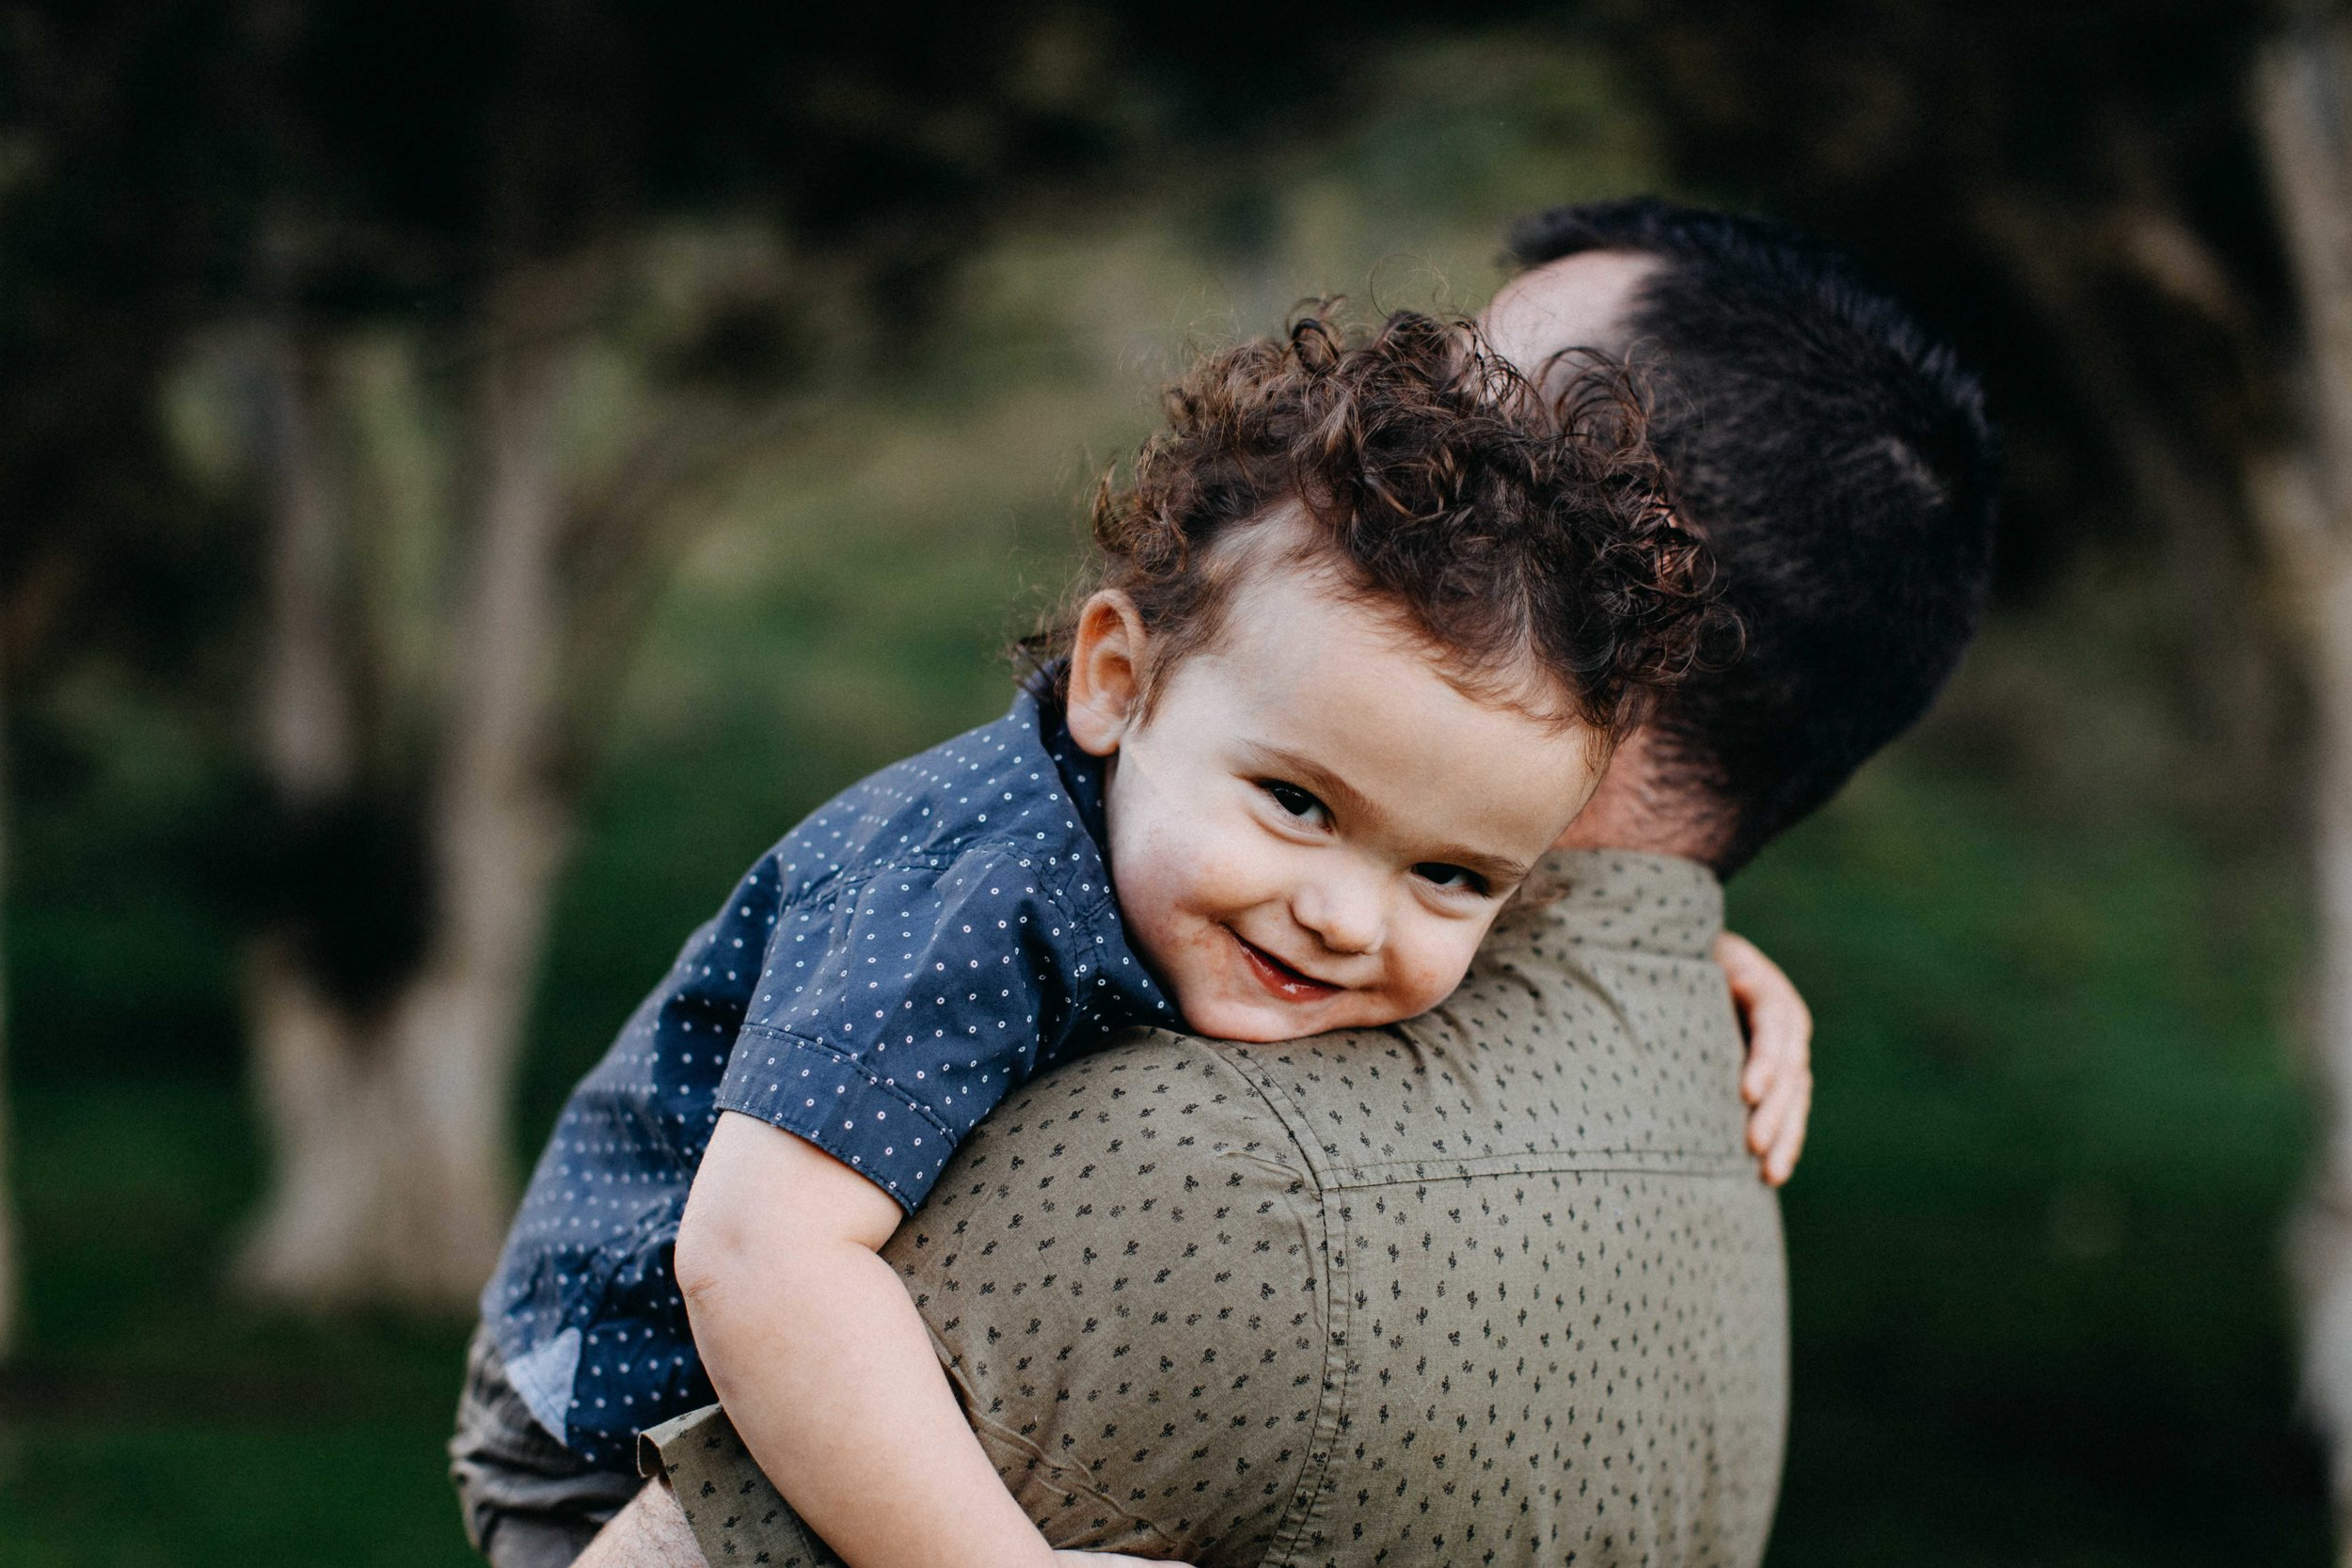 camden-maternity-photography-www.emilyobrienphotography.net-cassandra-22.jpg